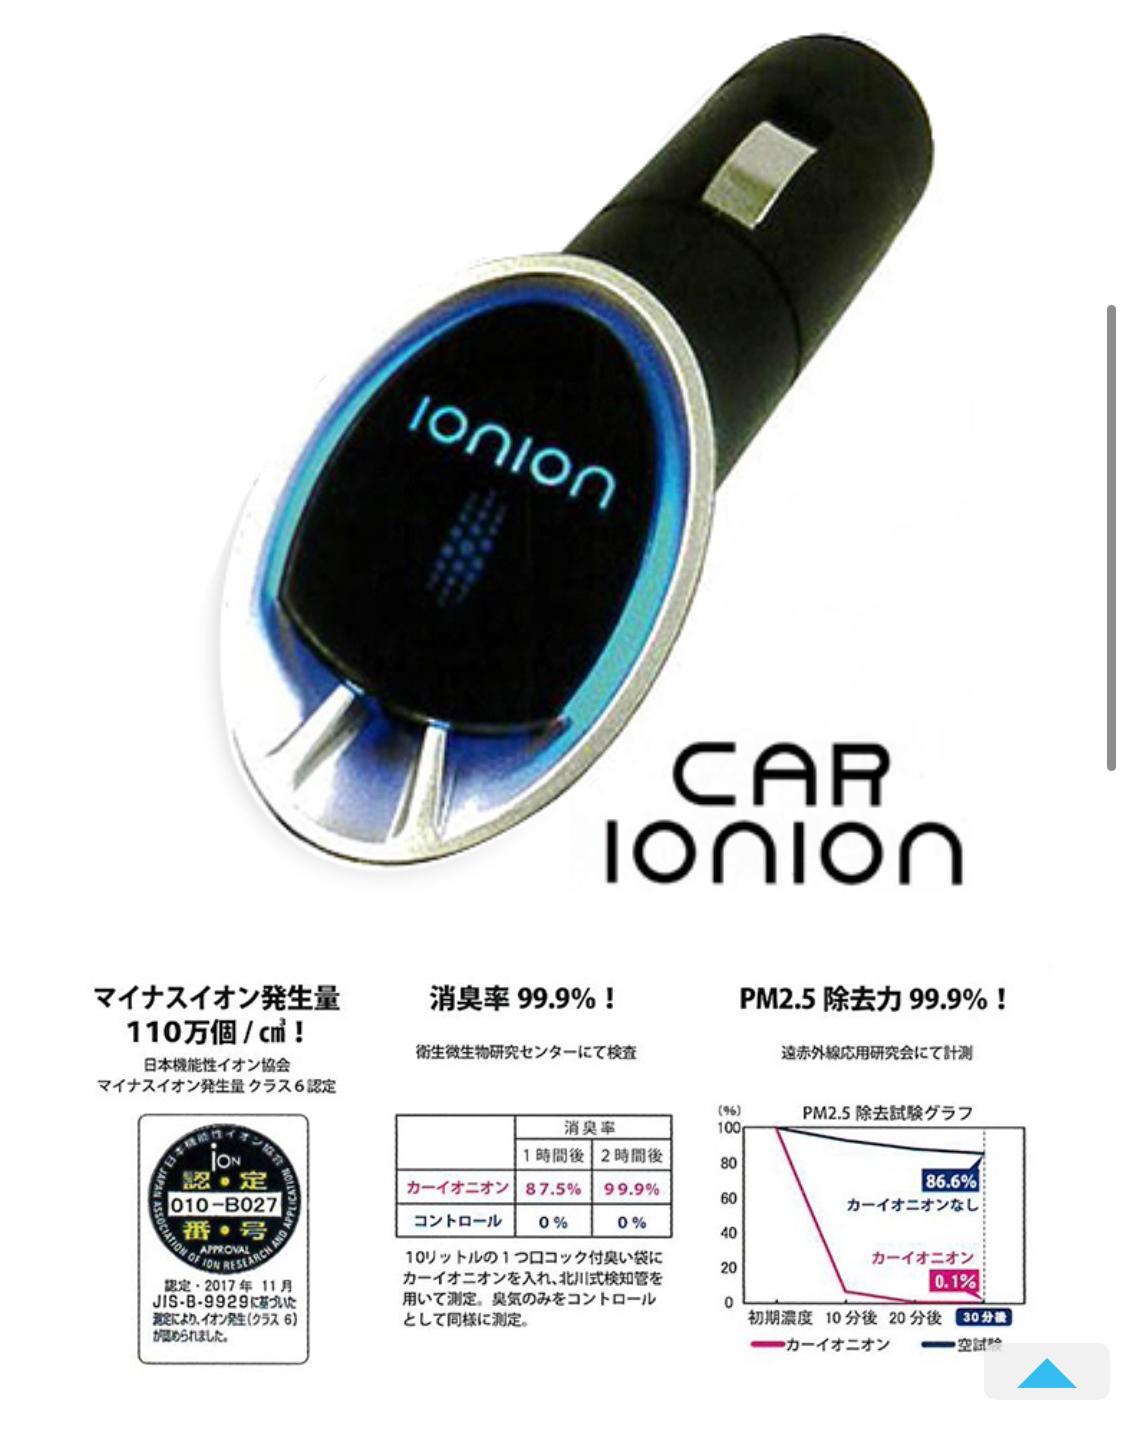 Car IONION車載負離子機